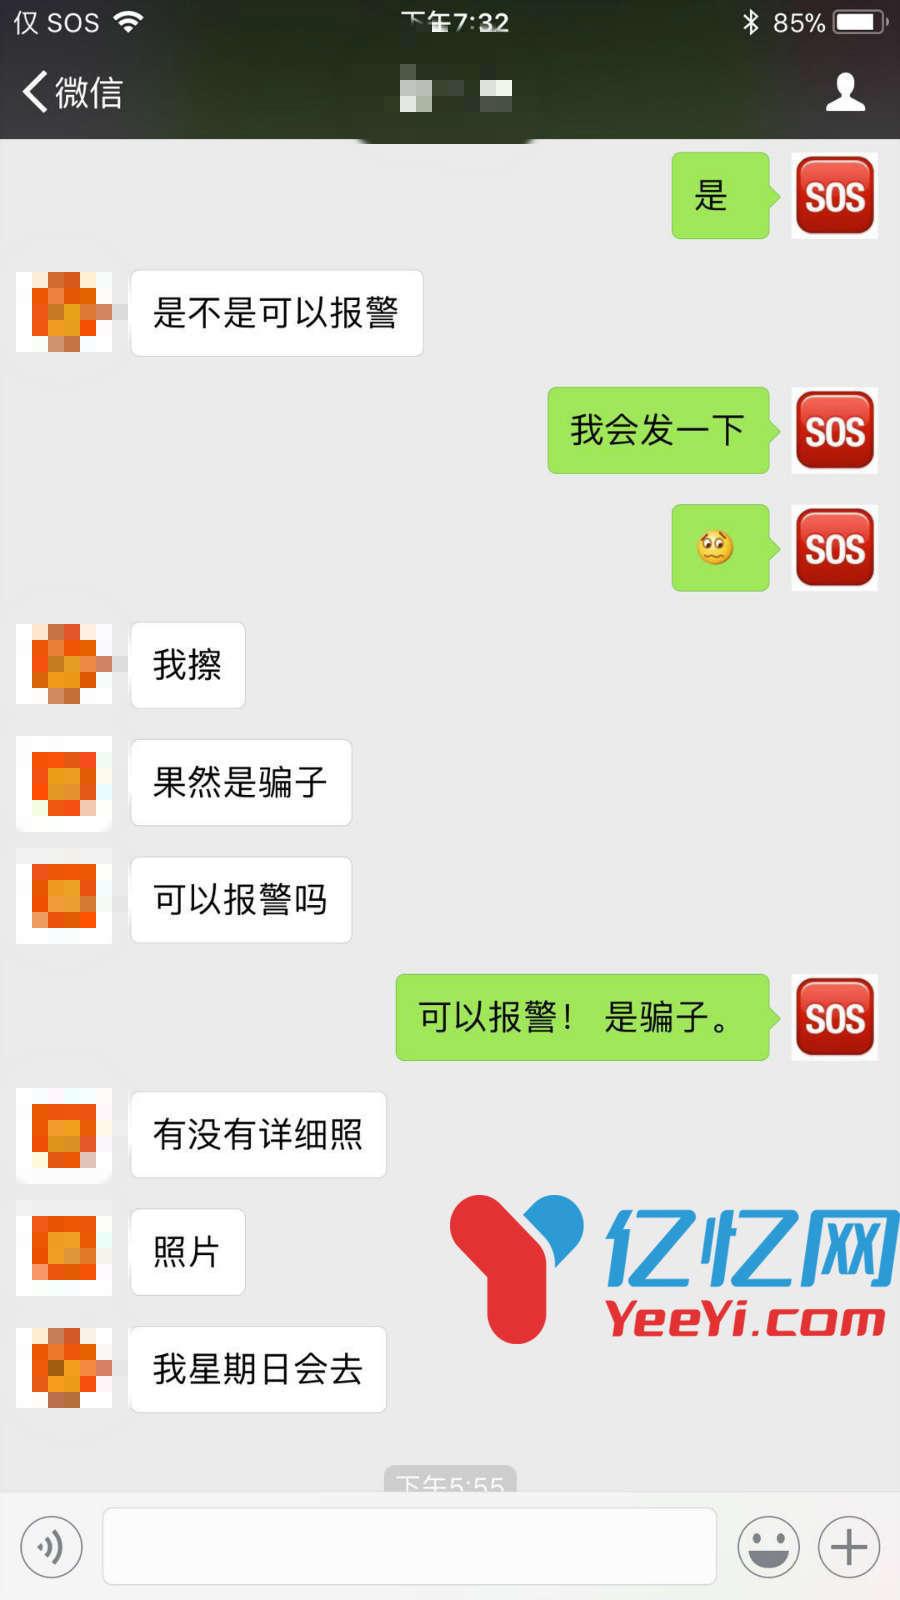 WeChat Image_20180705081720_meitu_3.jpg?x-oss-process=image/format,png